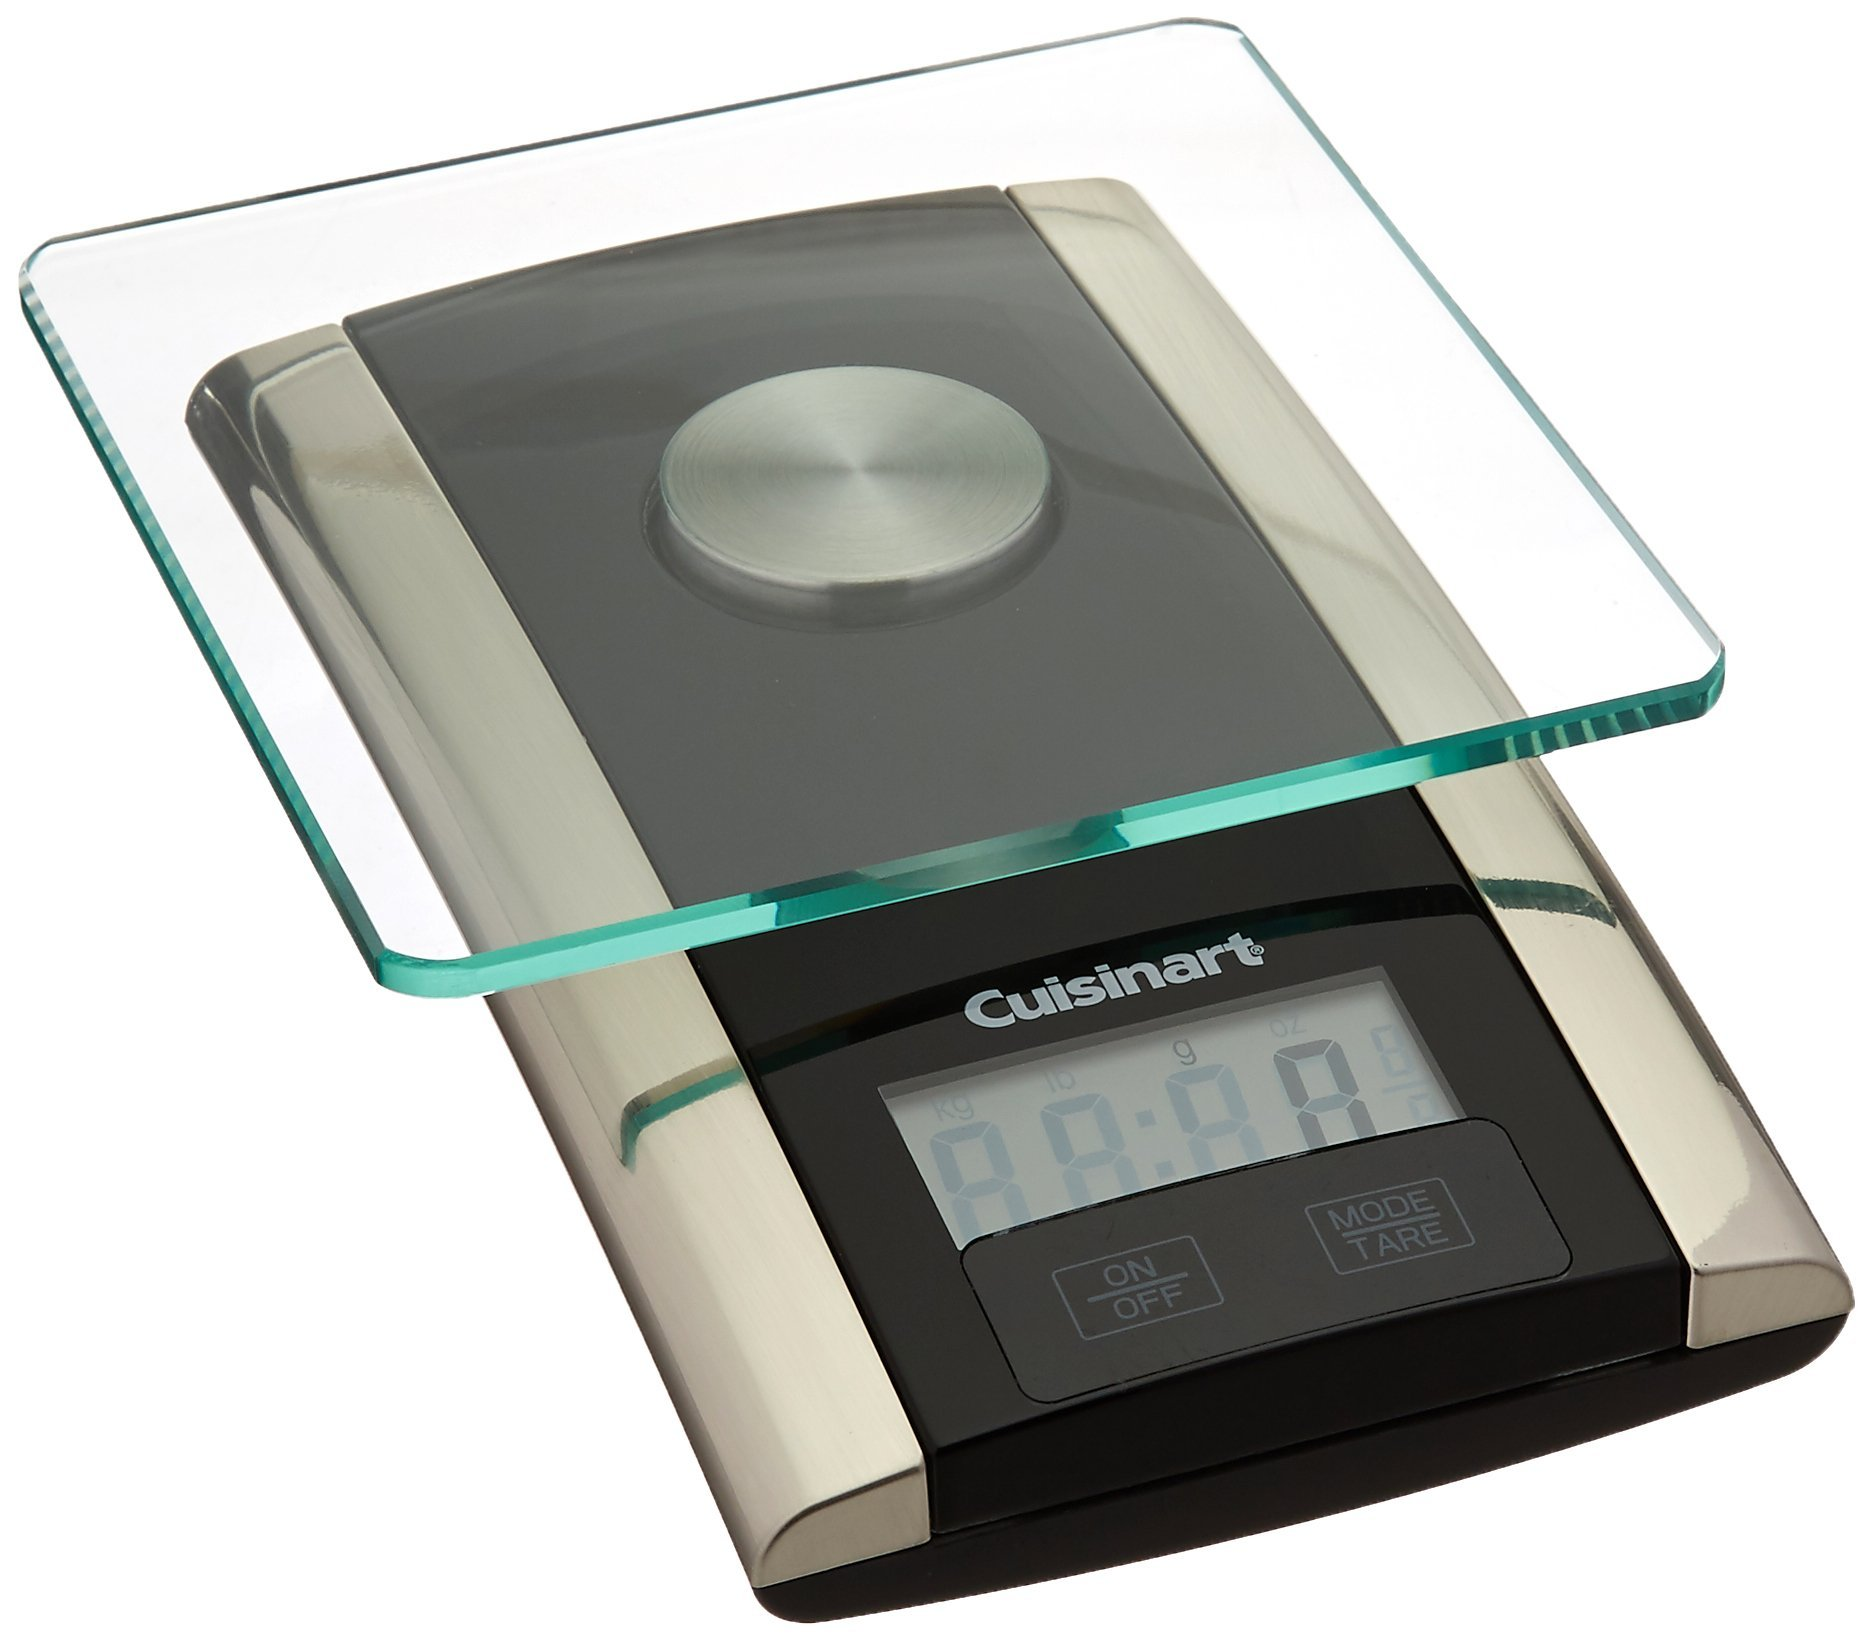 Cuisinart KS-55 Weight Mate Digital Kitchen Scale by Cuisinart